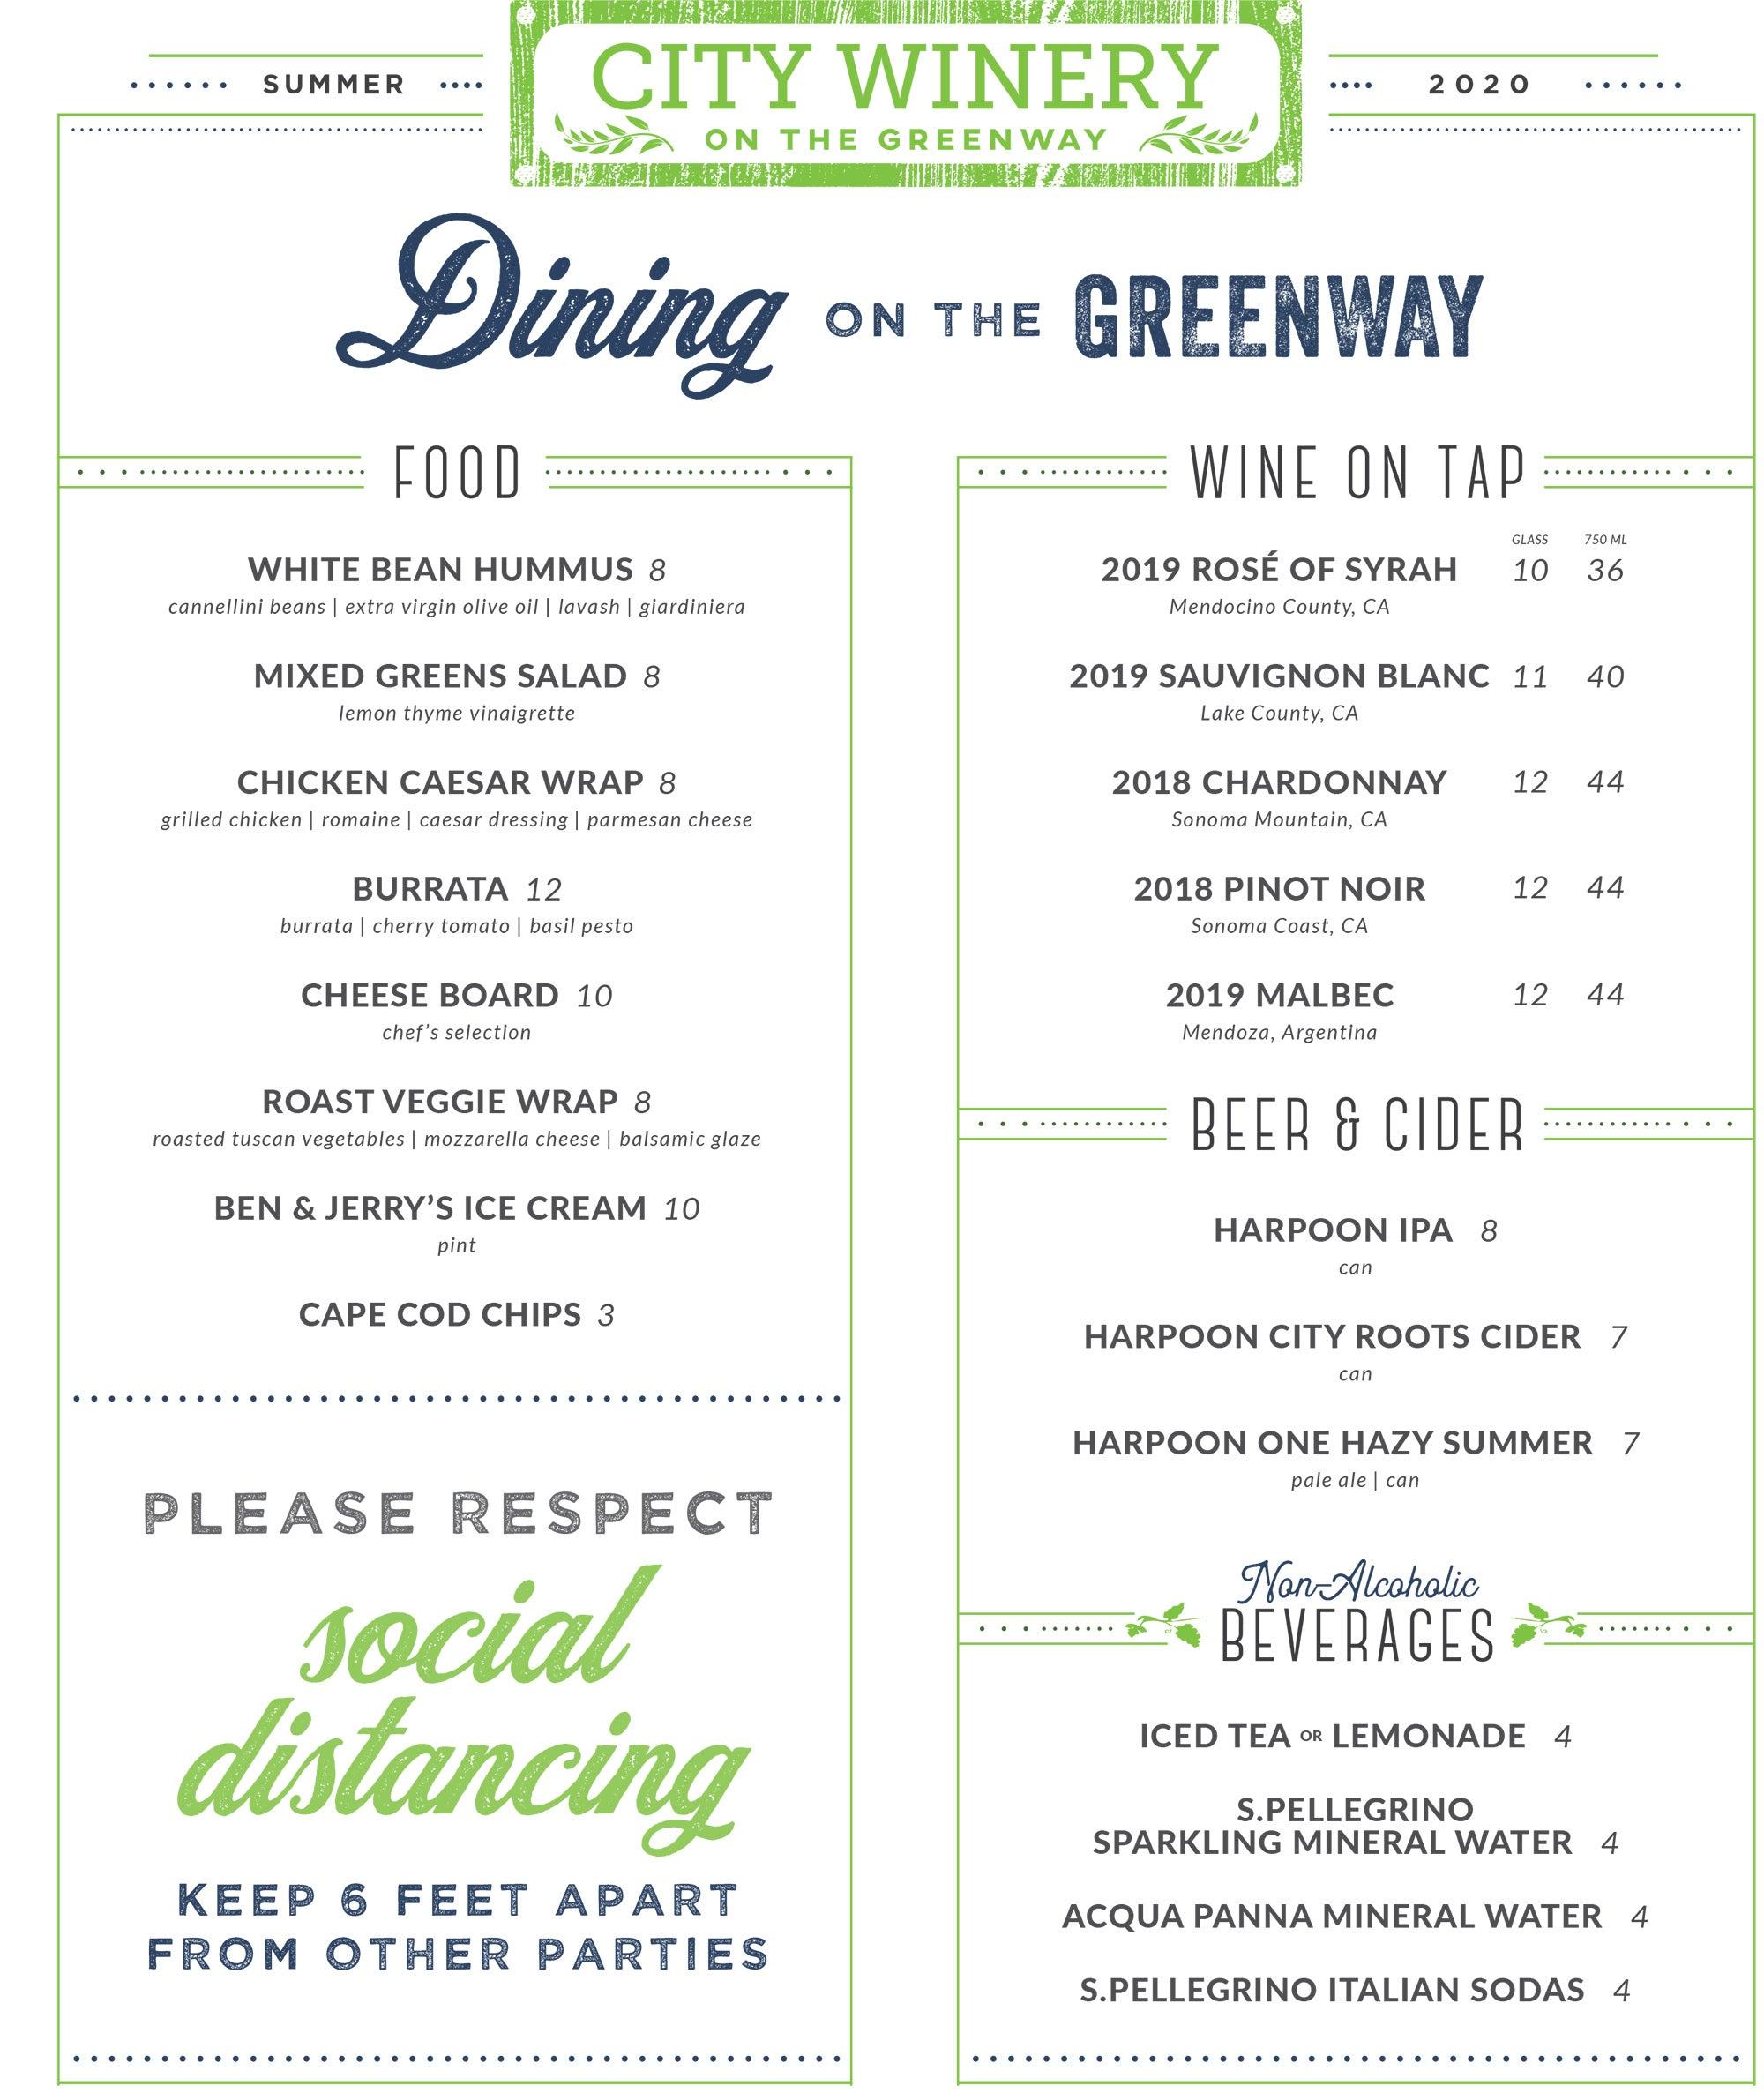 City Winery on The Greenway menu